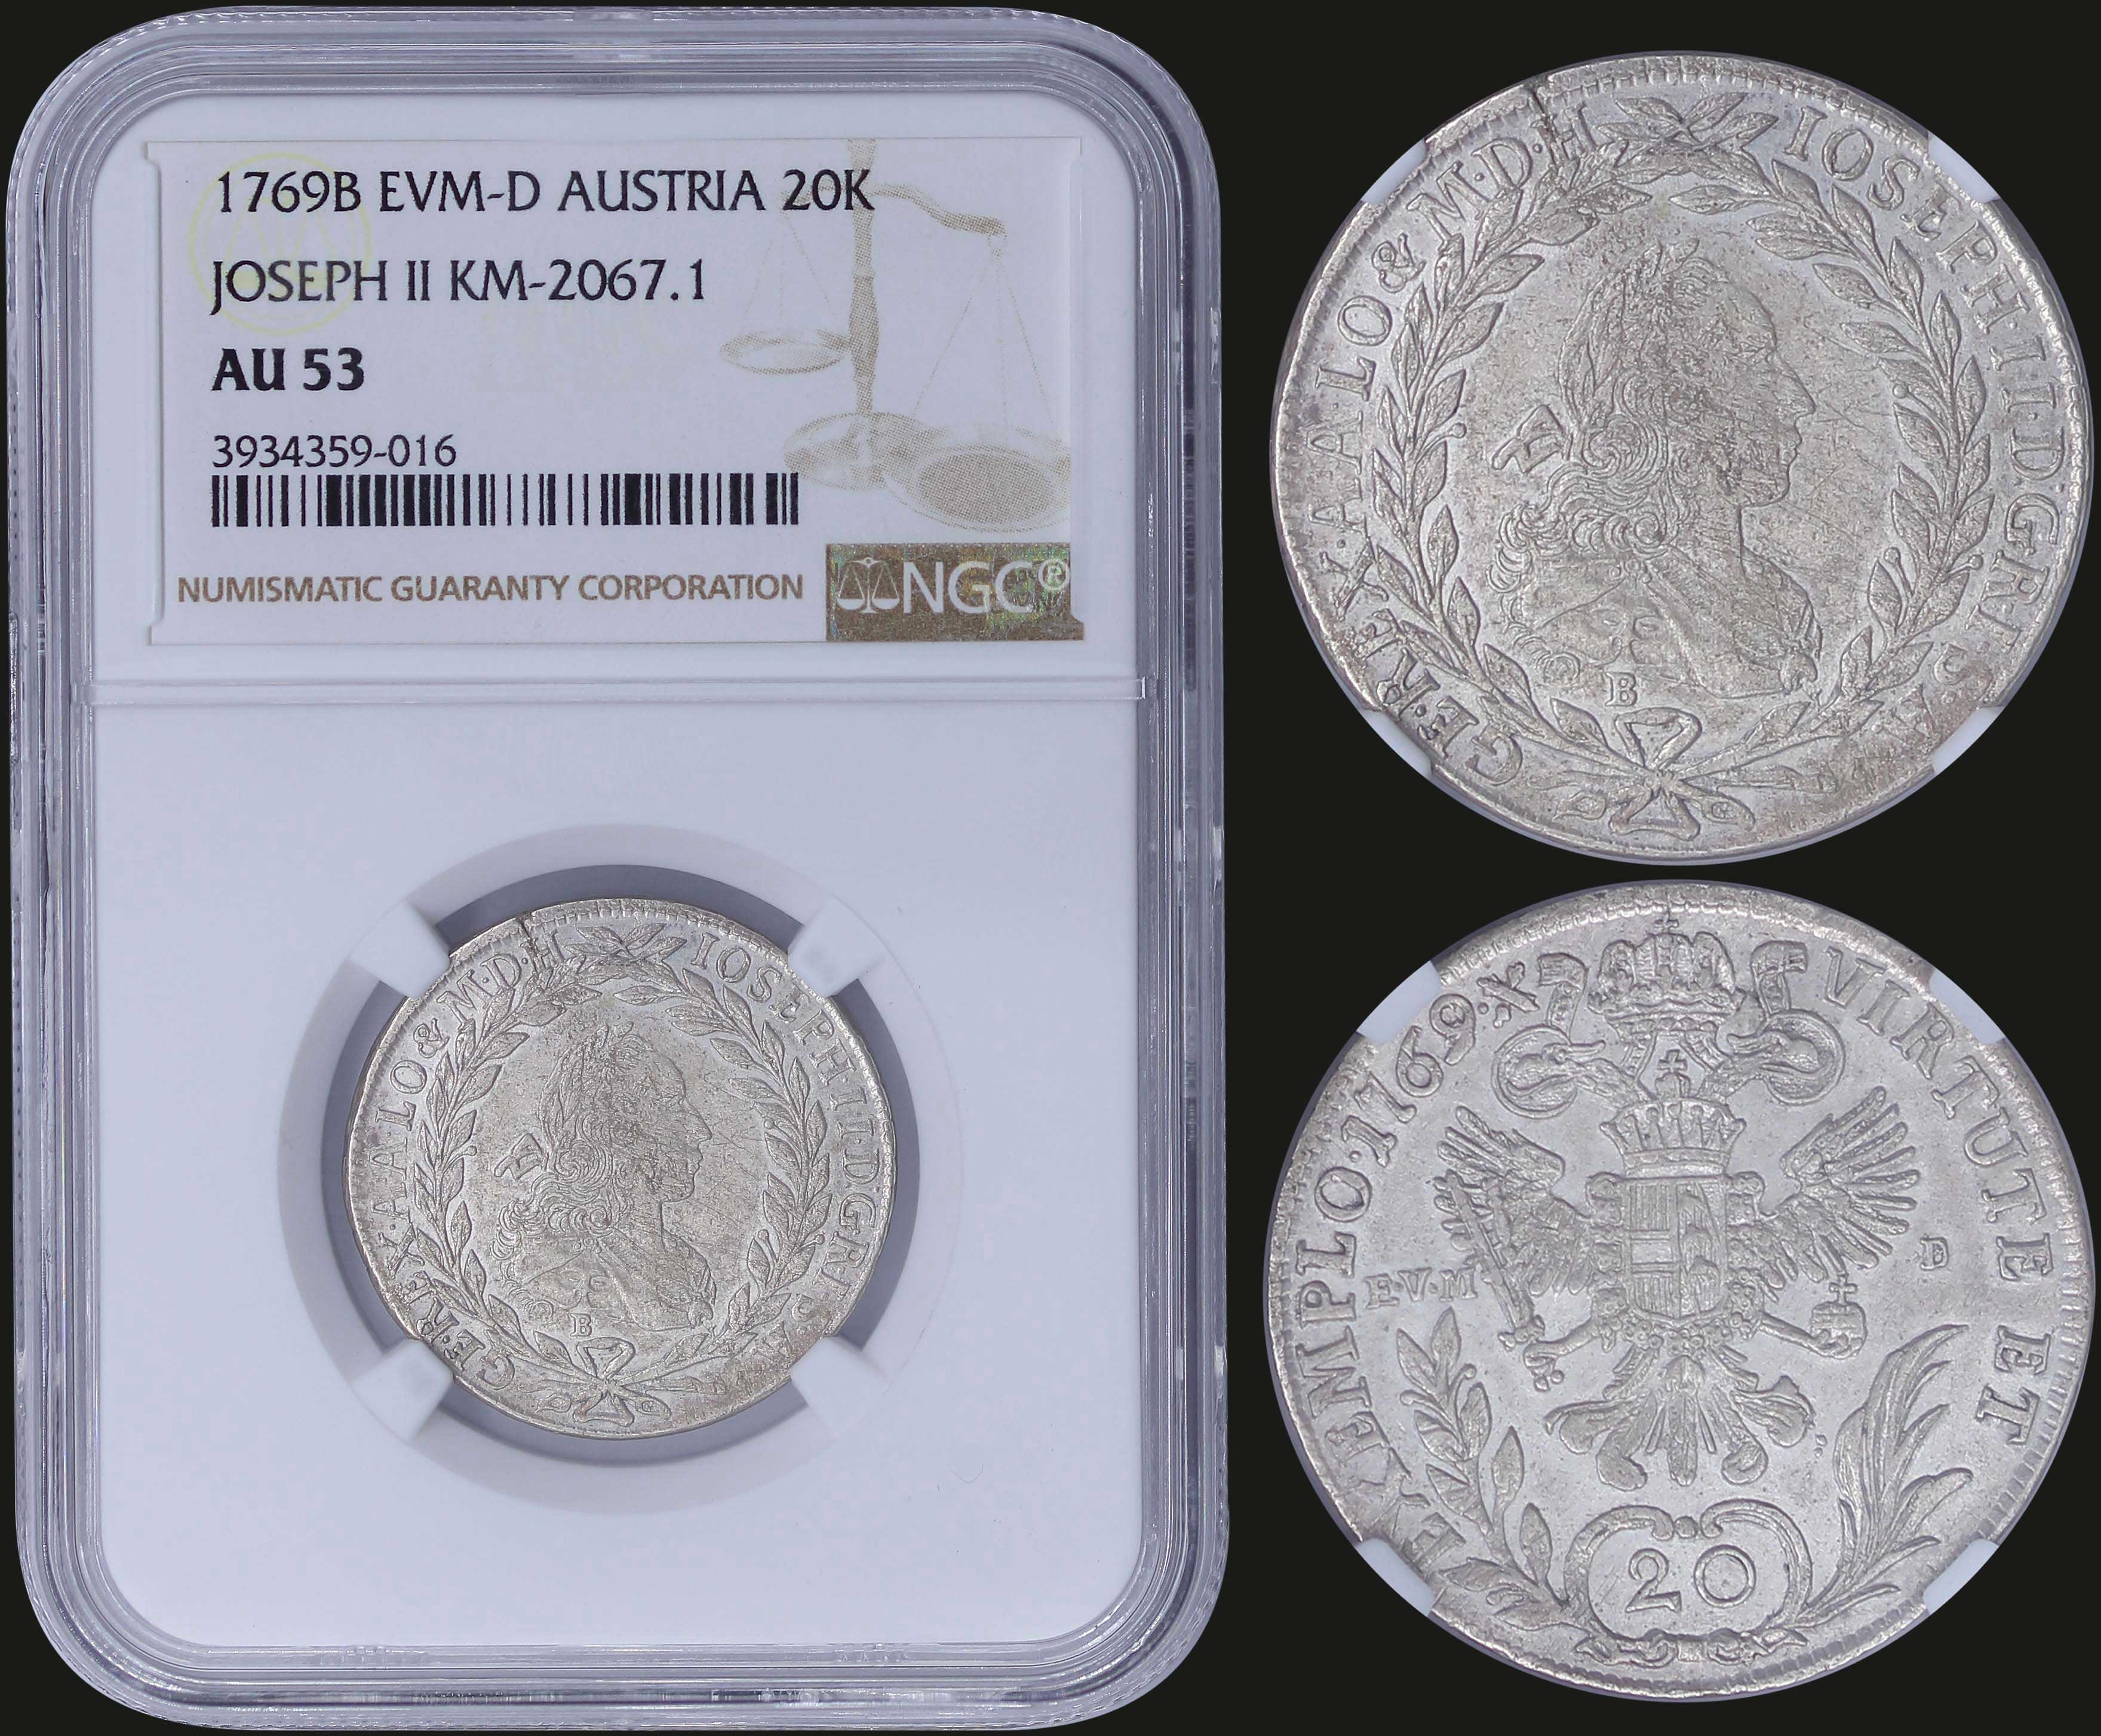 Lot 6785 - -  COINS & TOKENS COINS & TOKENS OF EUROPEAN COUNTRIES -  A. Karamitsos Postal & Live Internet Auction 984 (Part B)